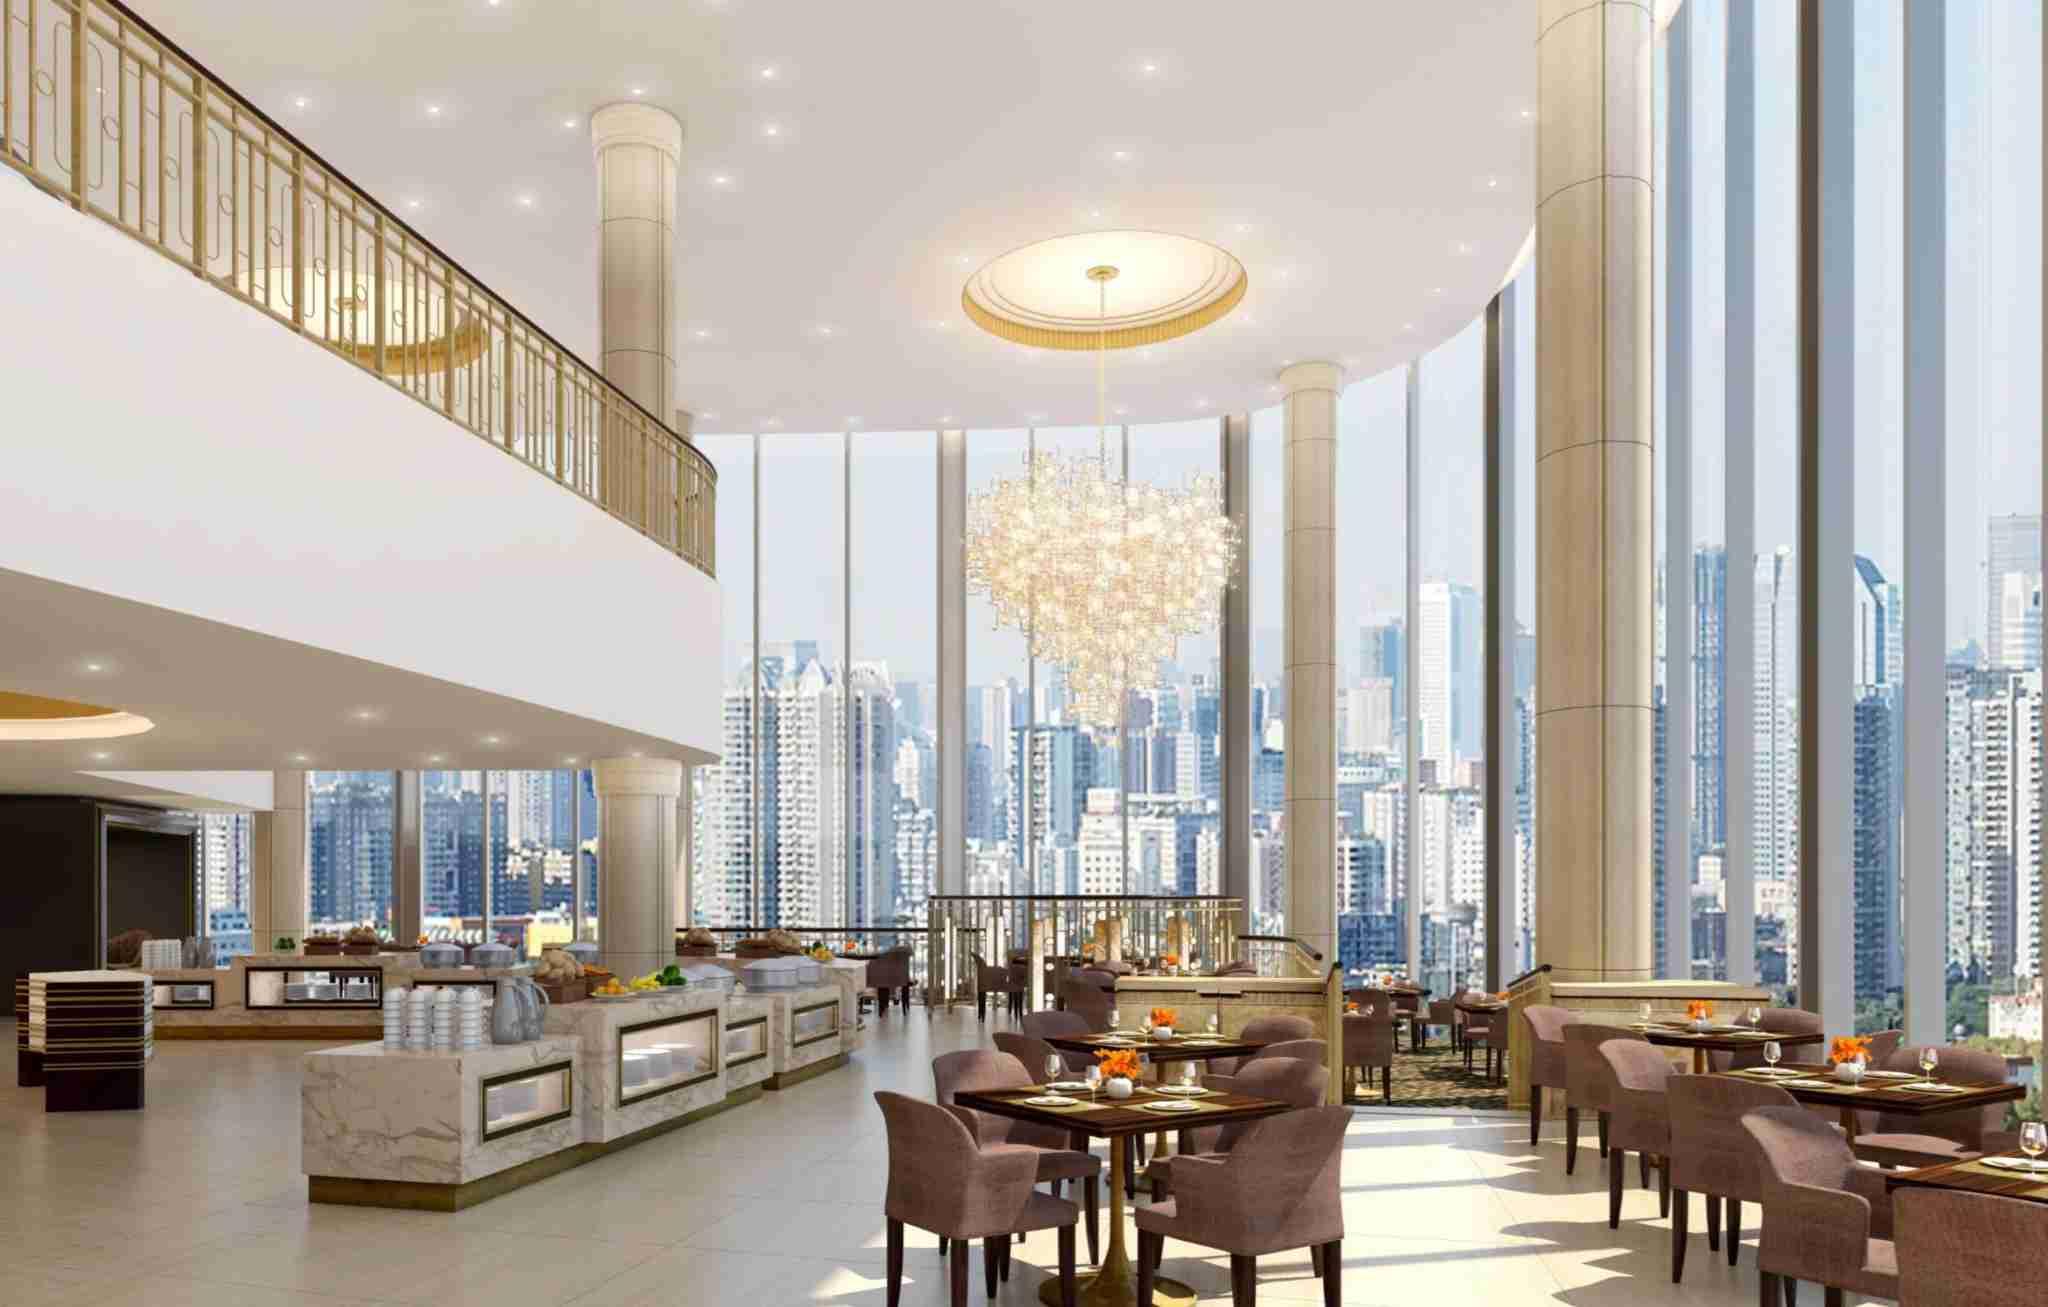 Image courtesy of The Waldorf Astoria Chengdu.